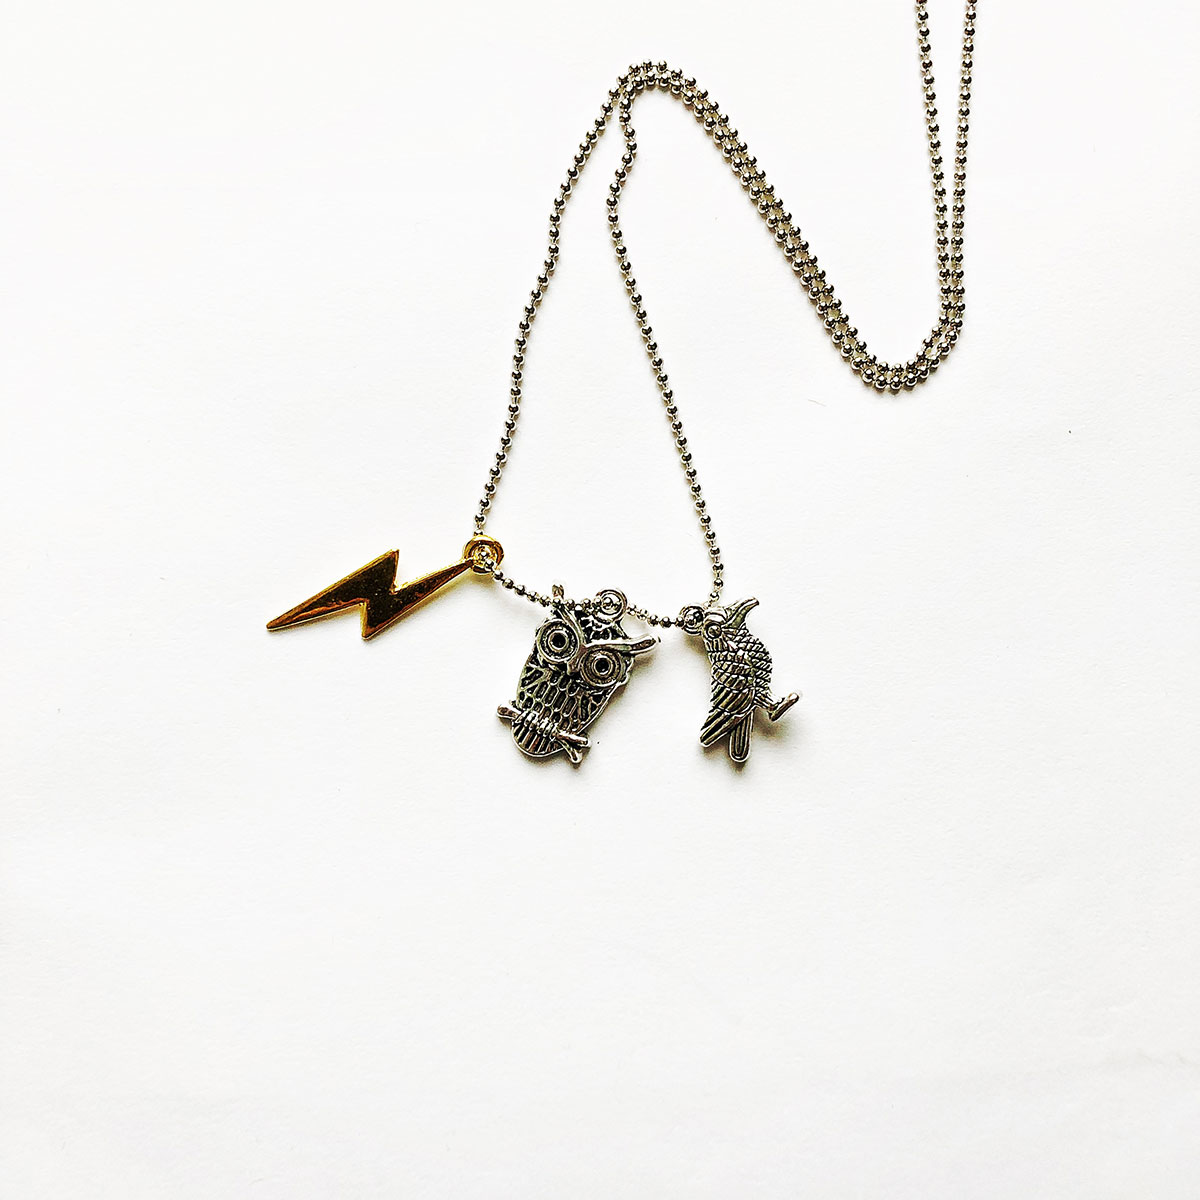 jenn-garman-artist-hp-necklace-ravenclaw